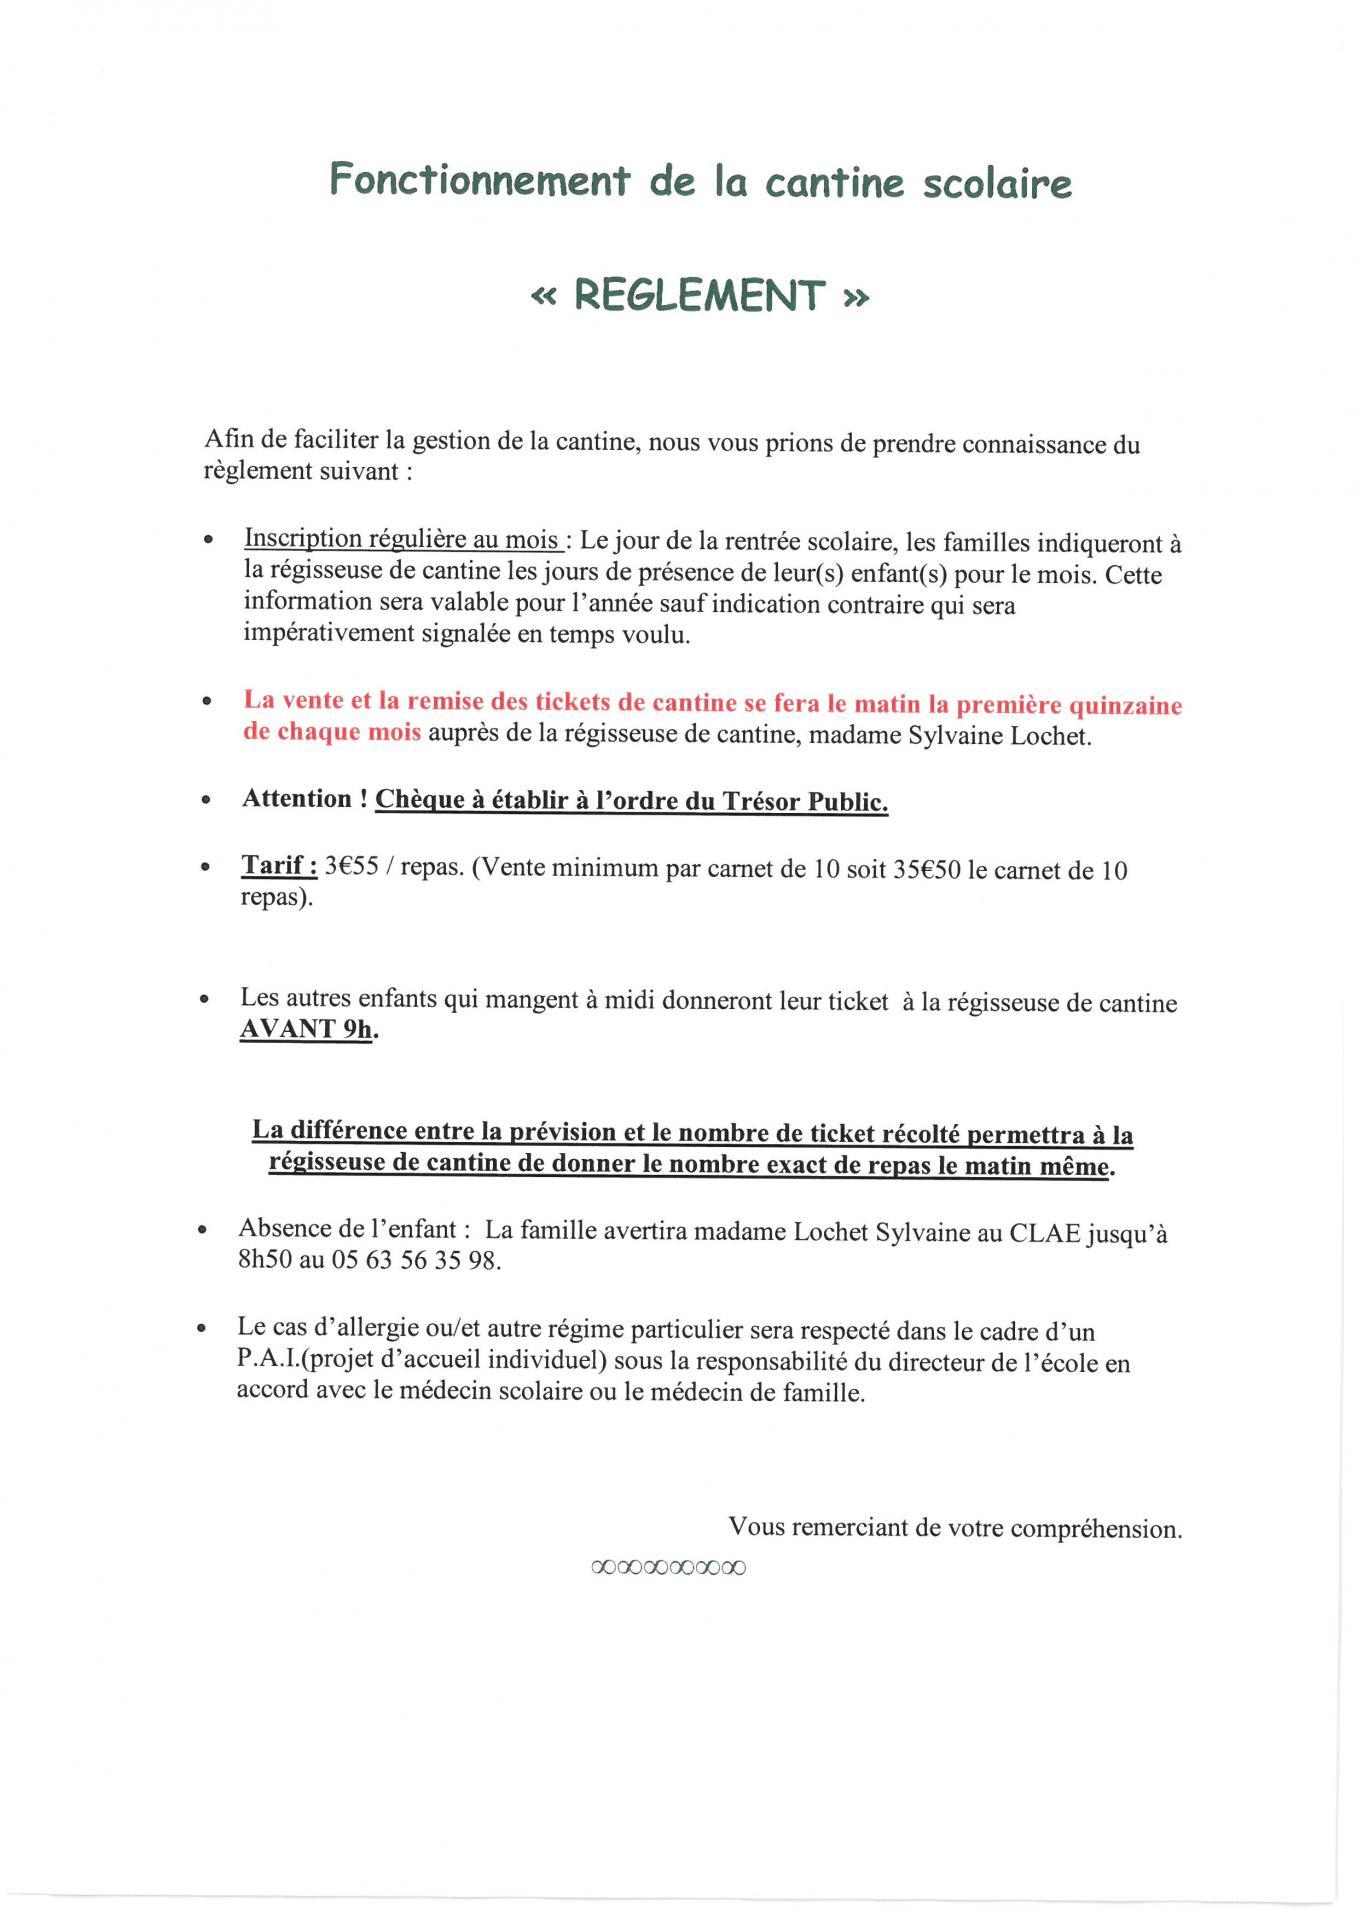 Cantine reglement 2018 2019